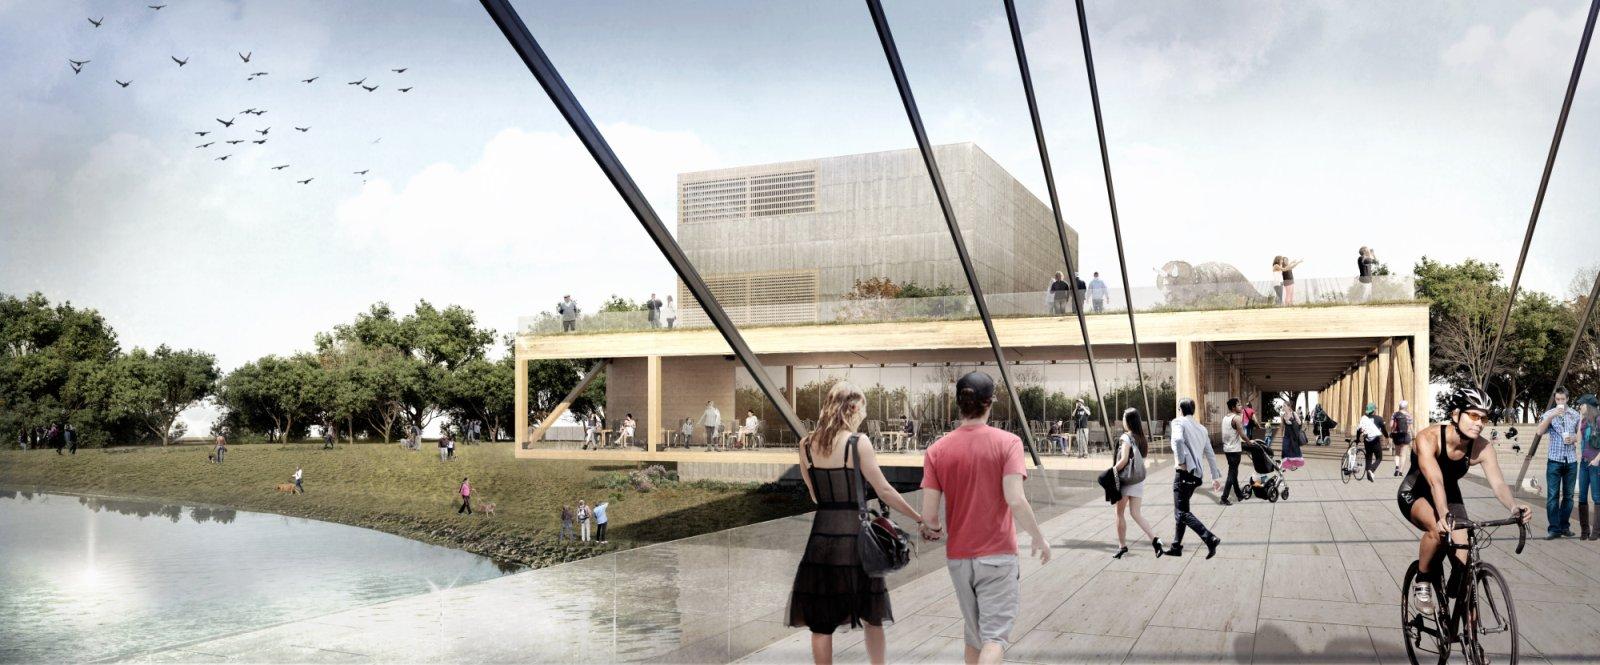 Kaunas Science Island Science and Innovation Center